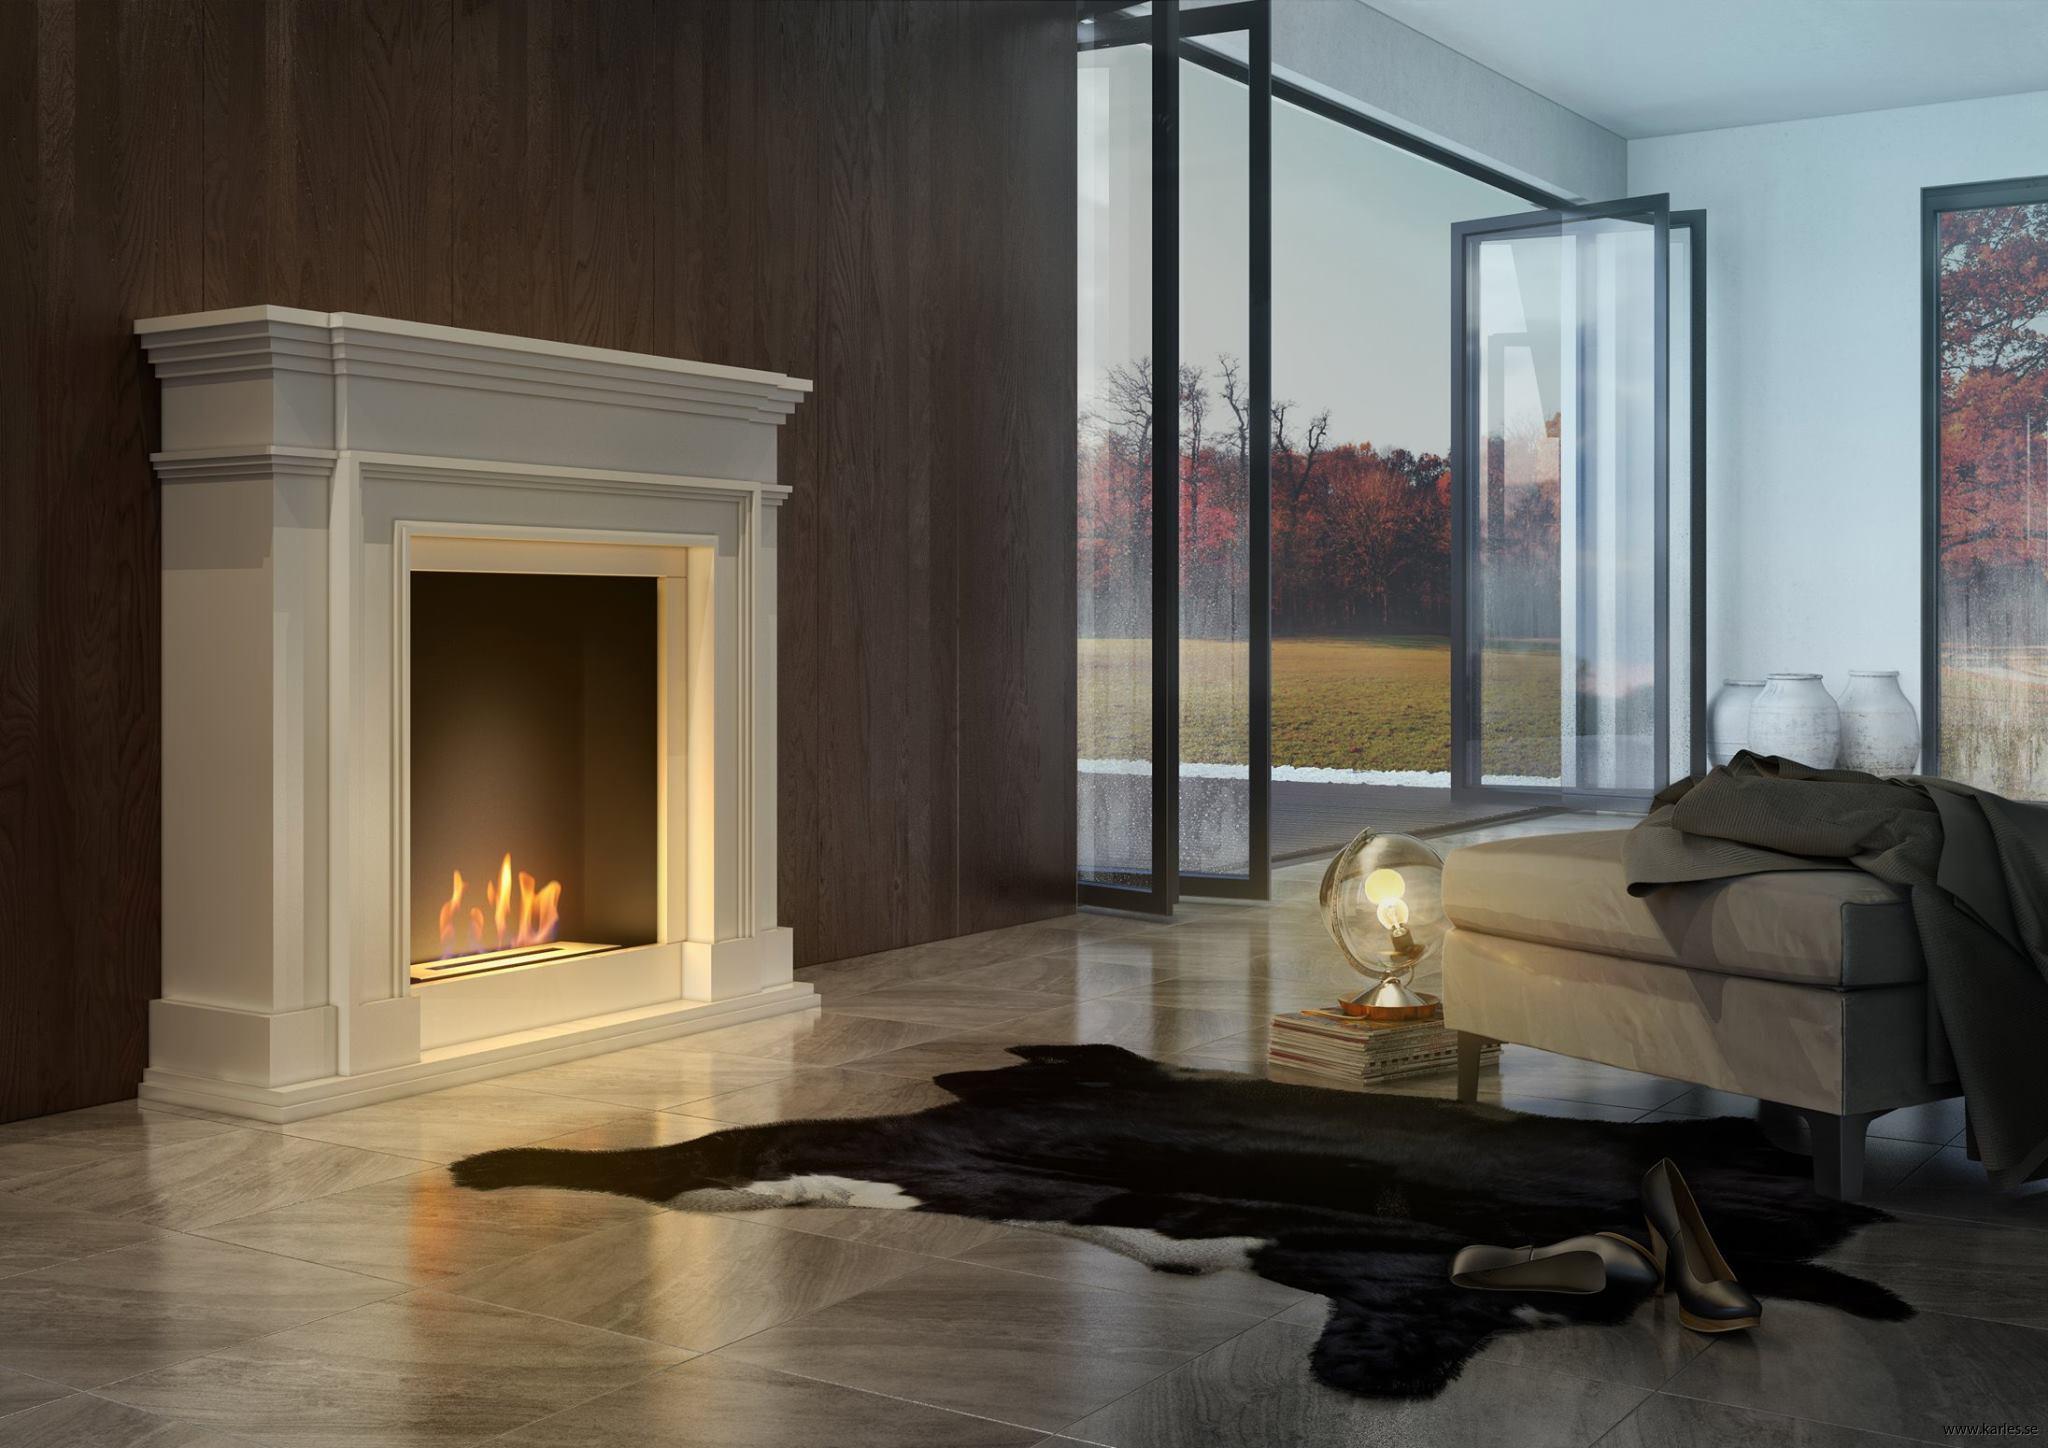 skorstensfri etanol kamin med omramning legionis vit karles butik. Black Bedroom Furniture Sets. Home Design Ideas